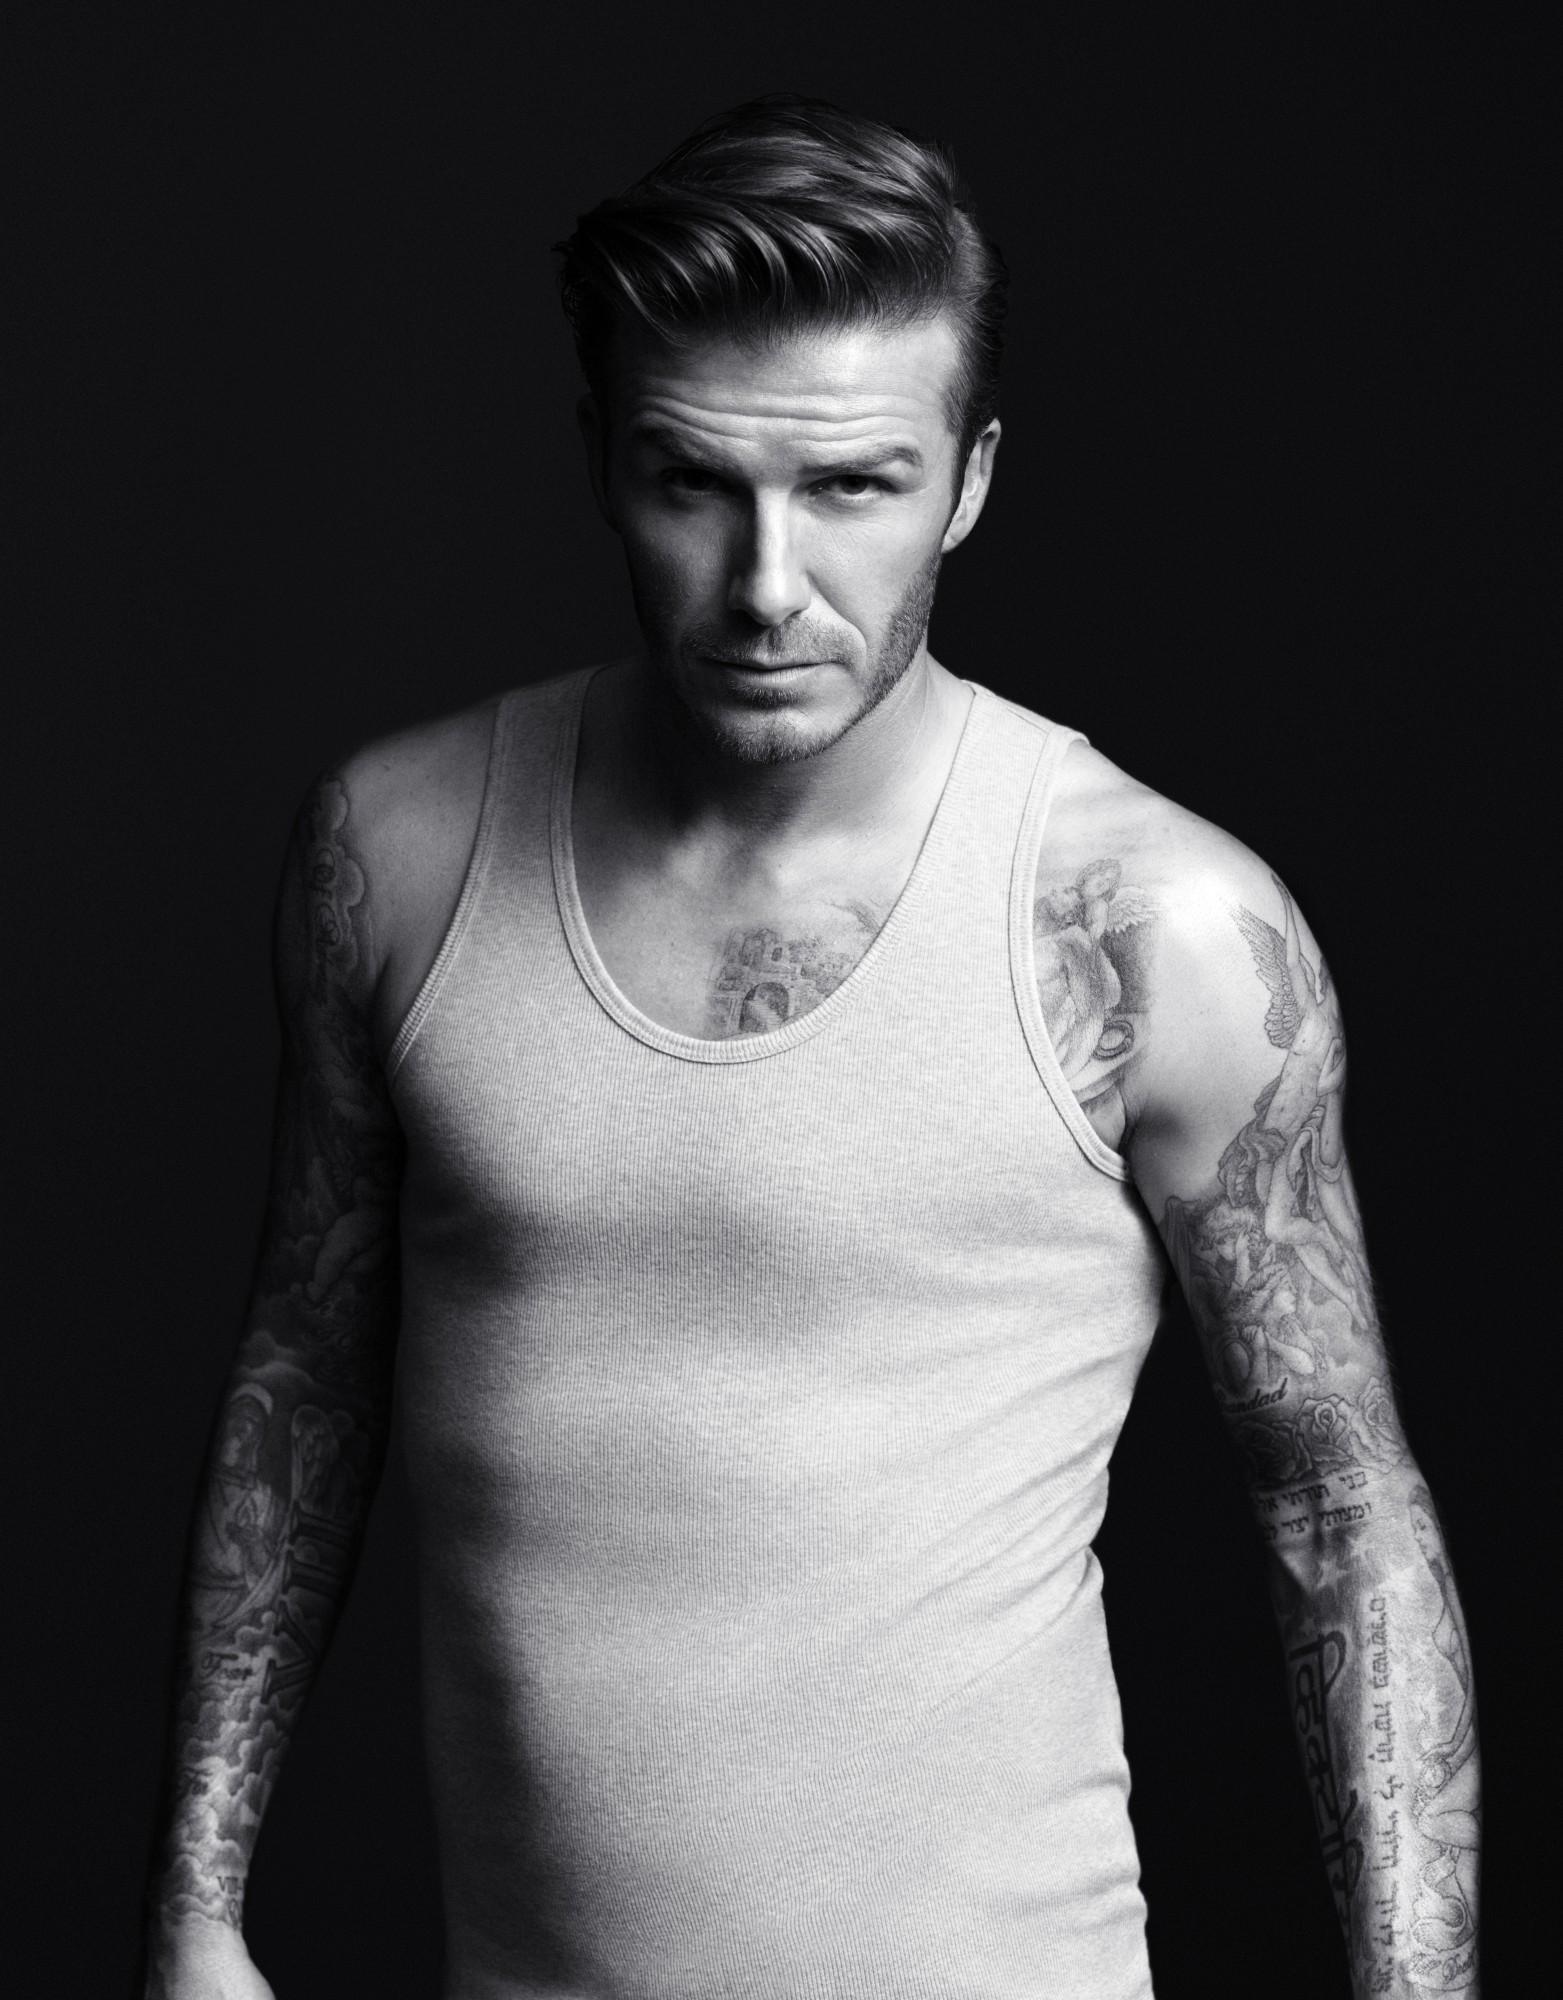 DAVID BECKHAM Bodywear collection for H&M photos, H&M David Beckham Super Bowl ad, Super Bowl commercial